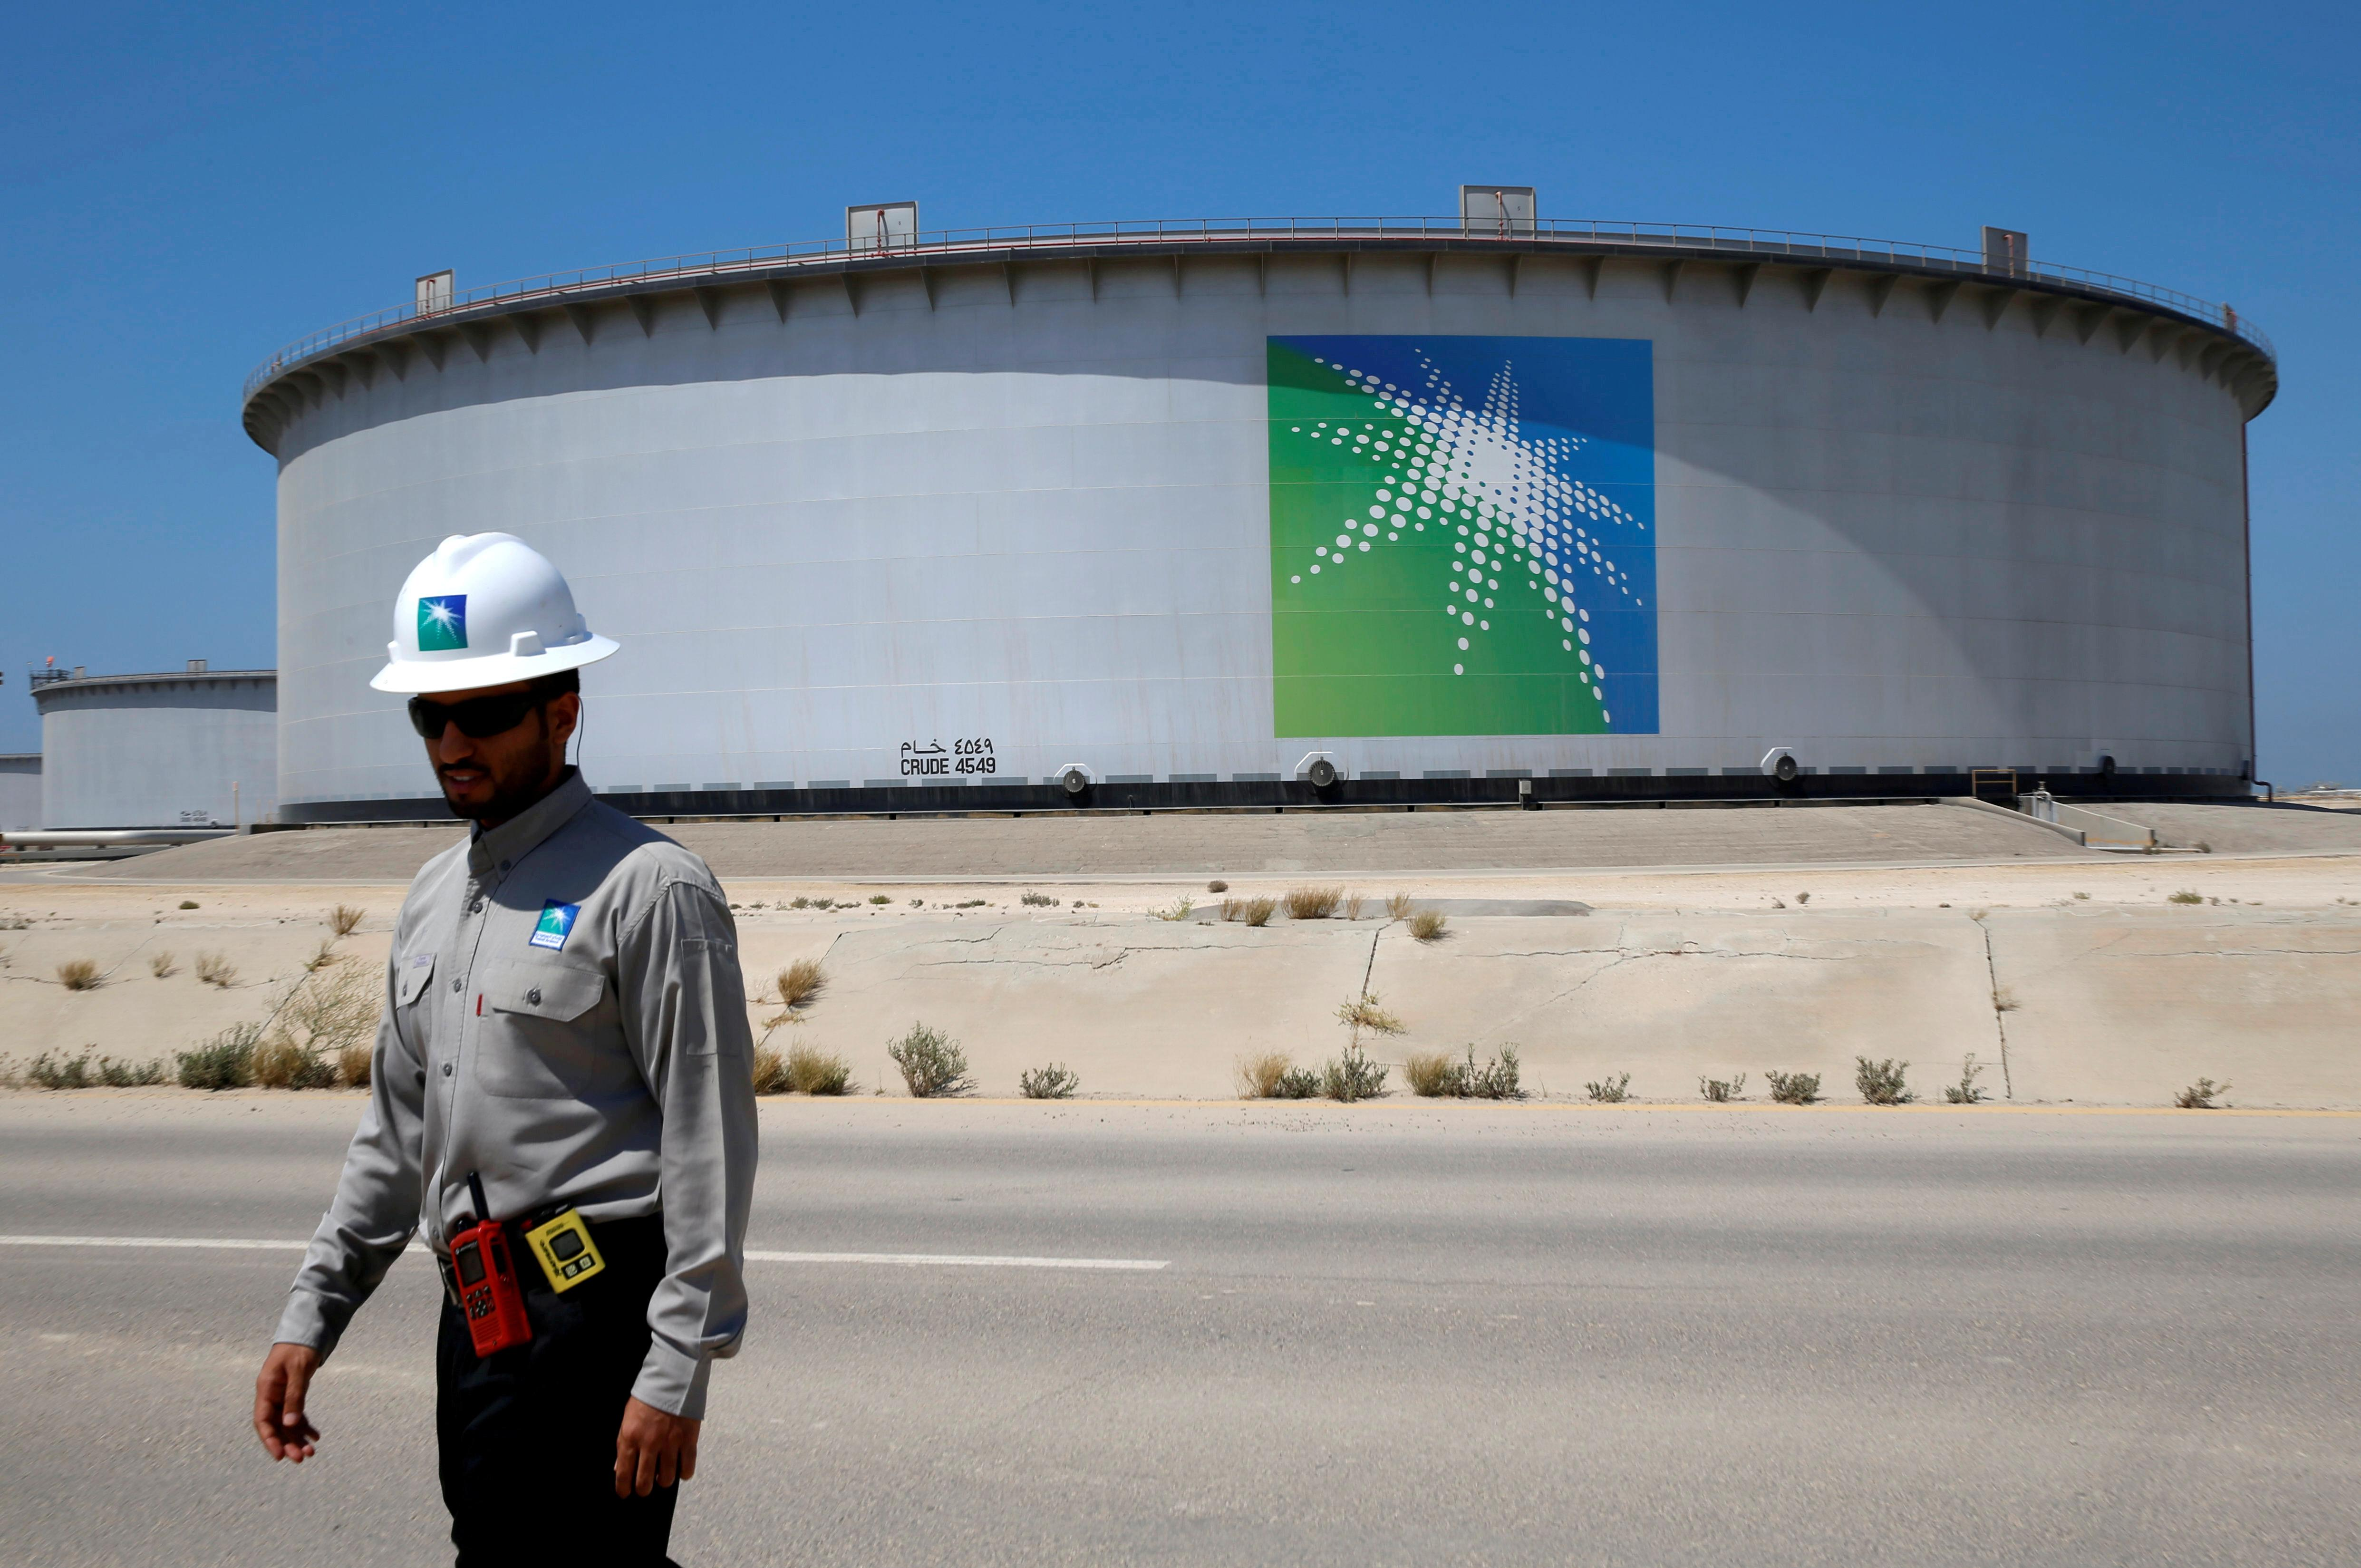 Column: Saudi Arabia waits for higher spot prices before raising oil exports